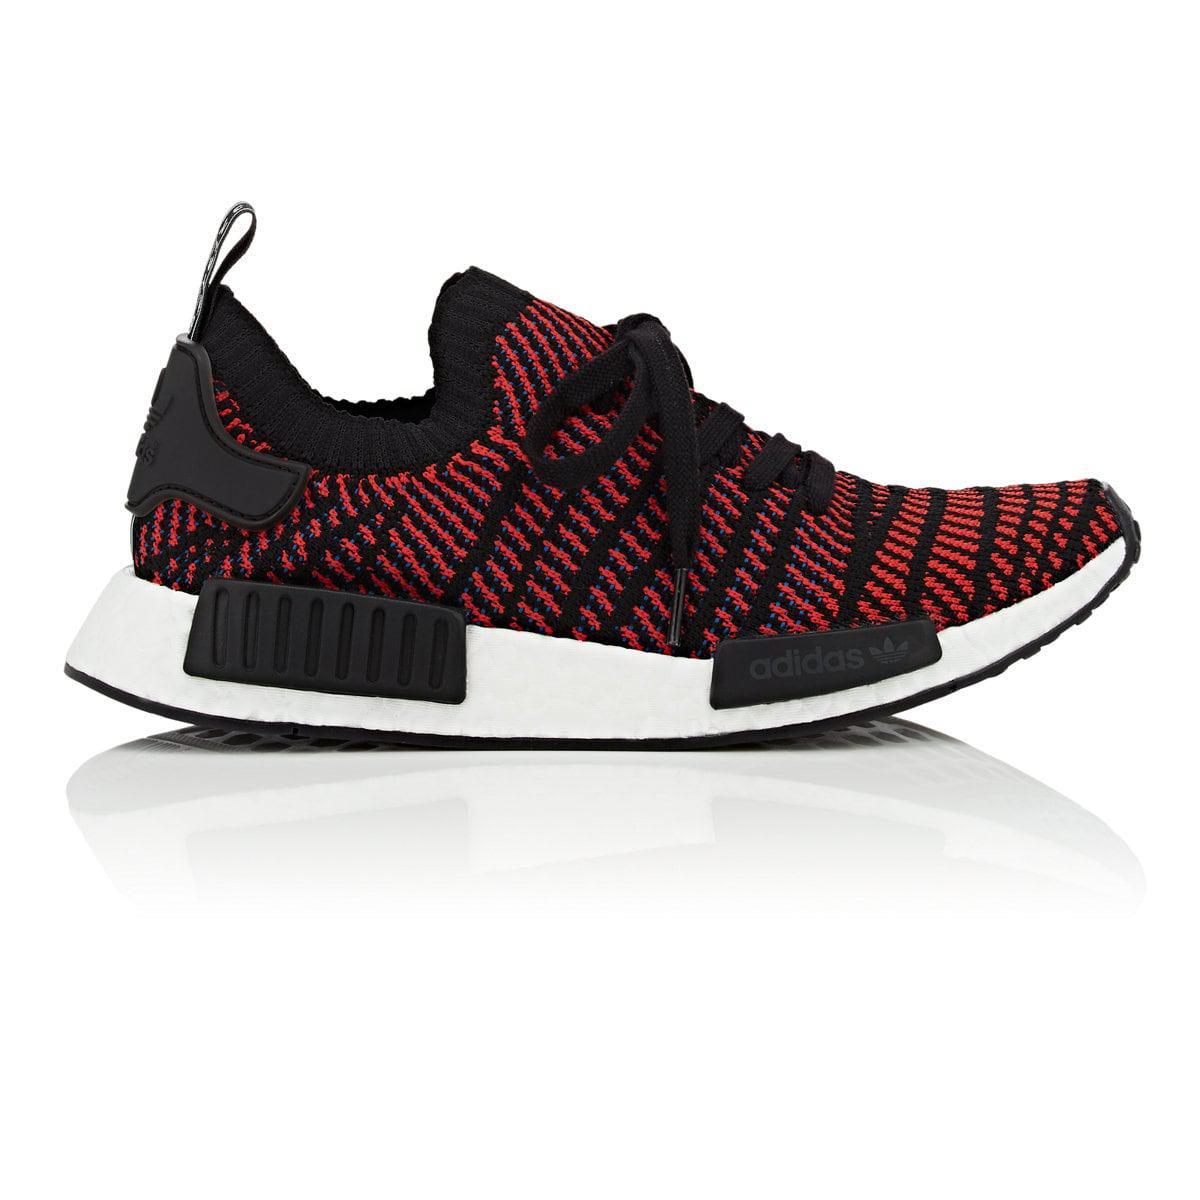 c23c351e9 Adidas - Multicolor Nmd r1 Stlt Pk Primeknit Black red Solid-blue Running  Shoes Cq2385